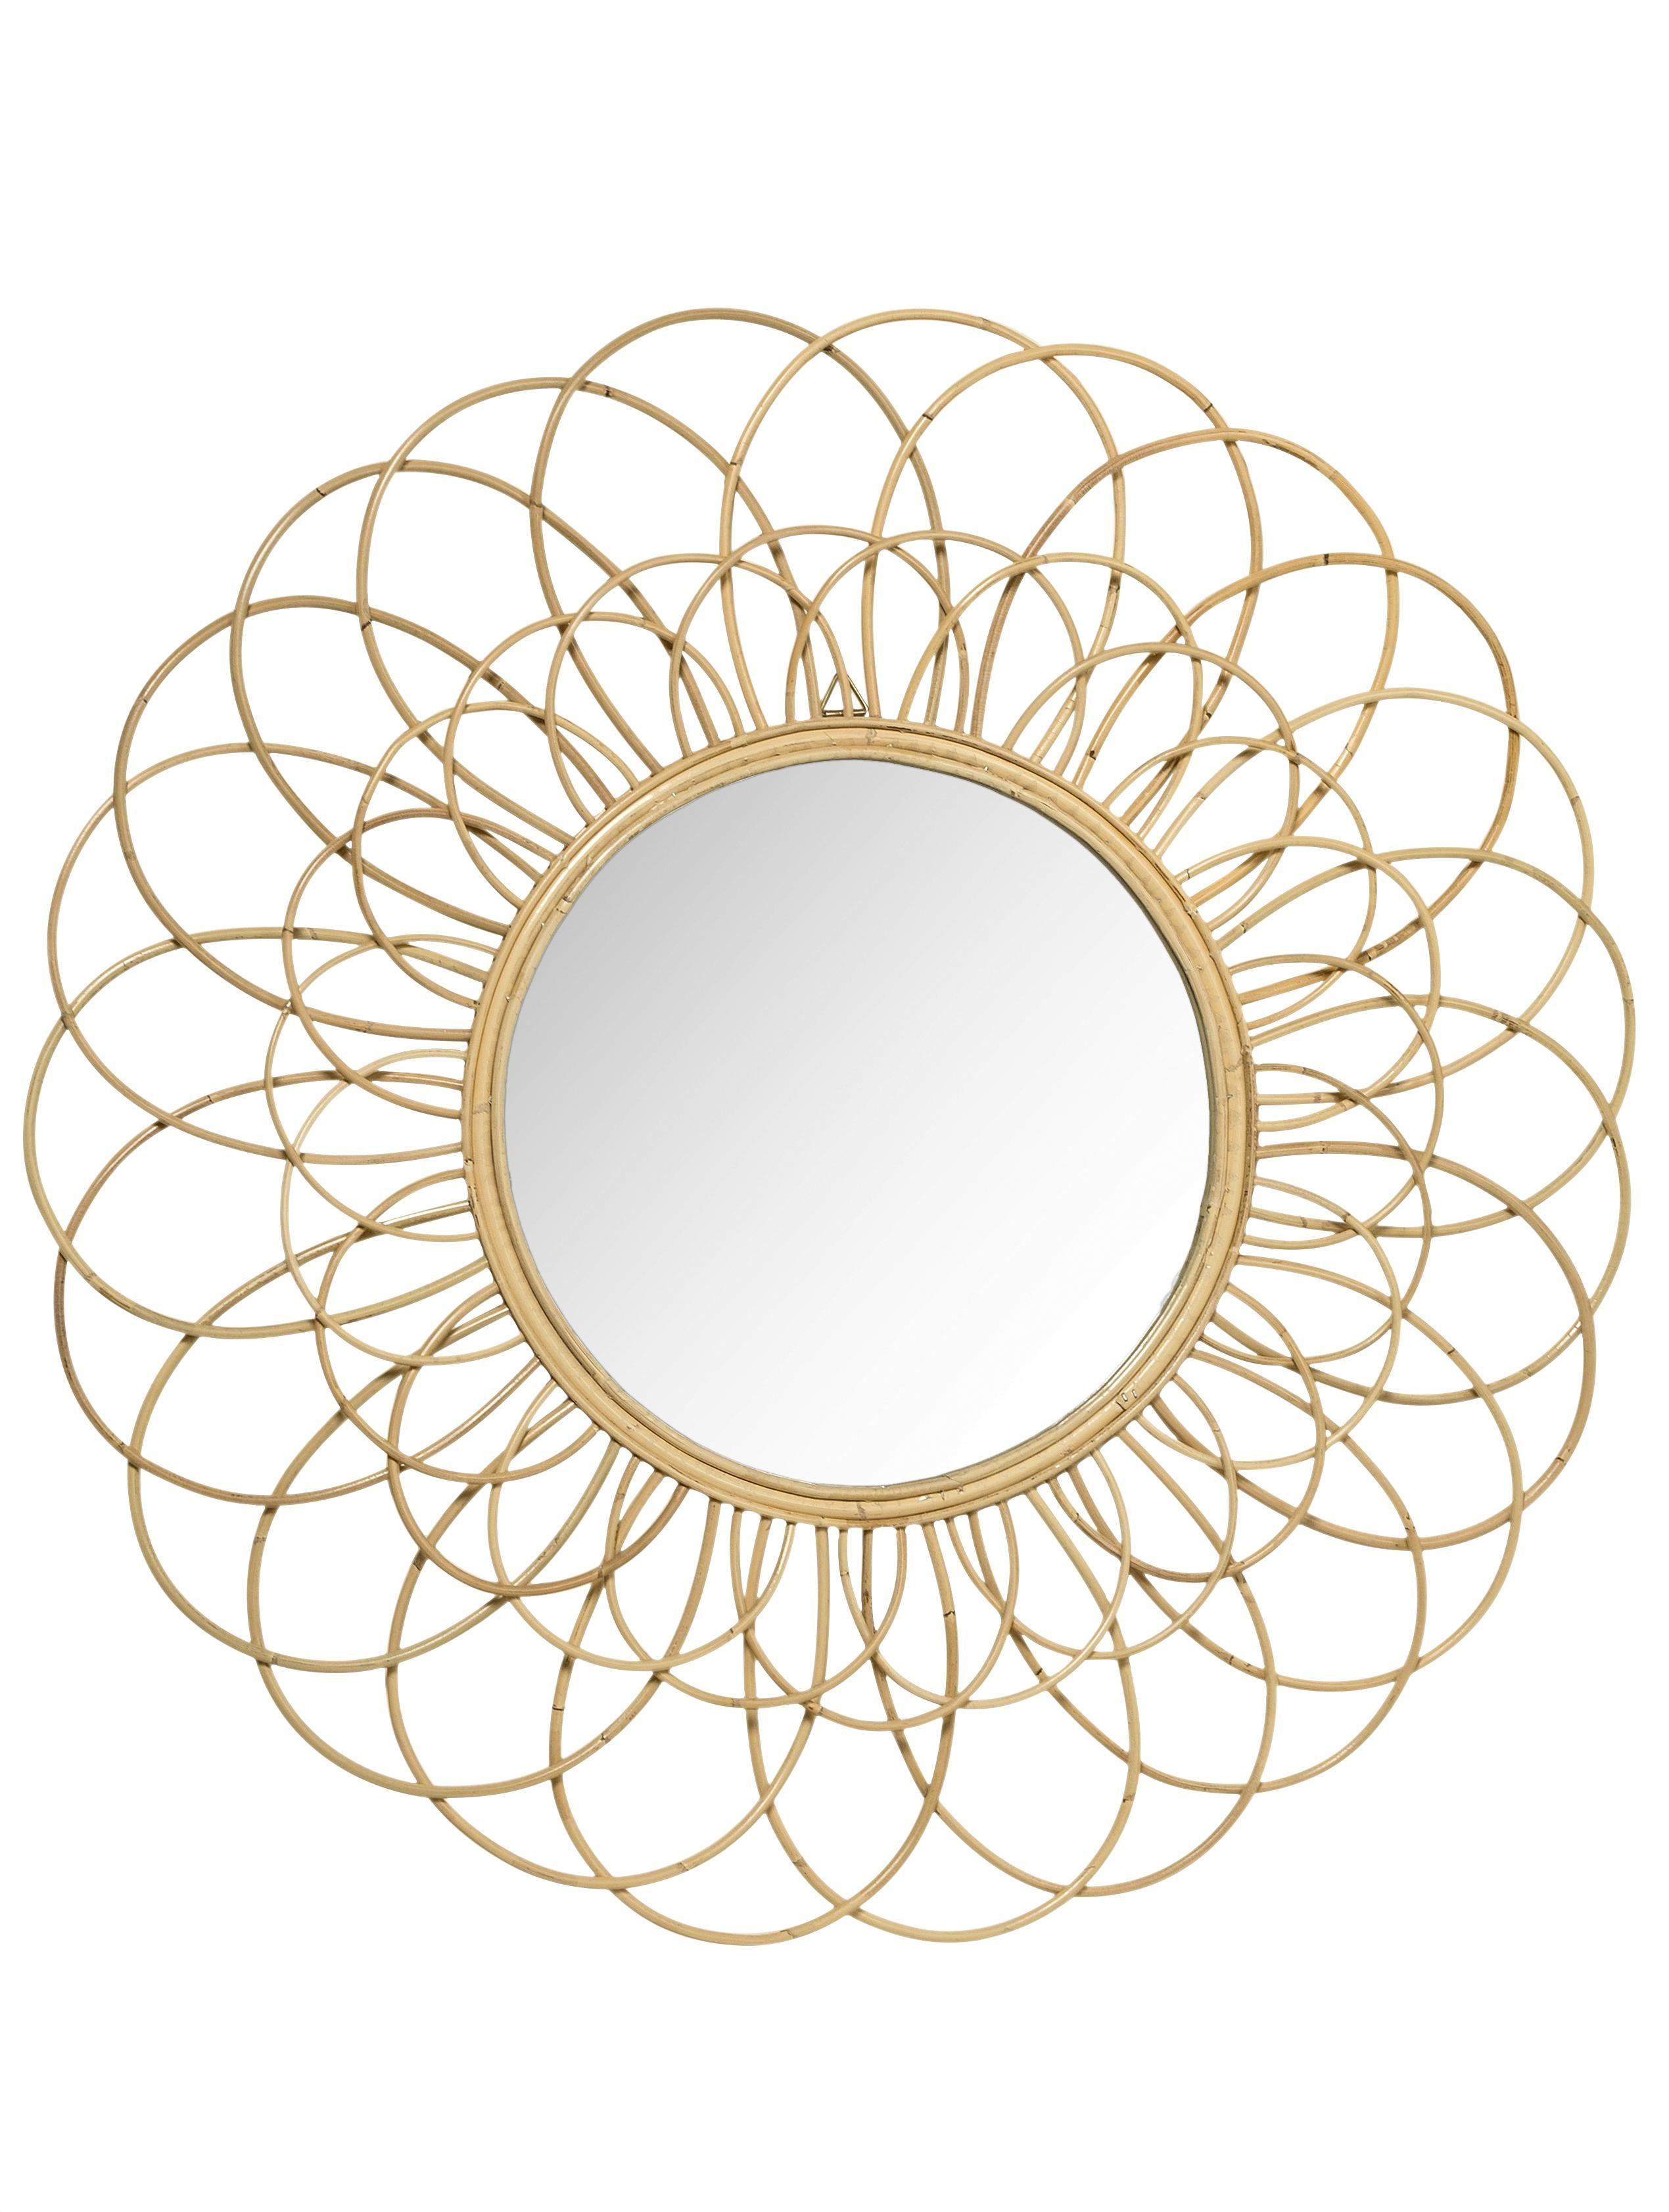 Goldener Wand Spiegel Wandspiegel Spiegel Sonnenspiegel